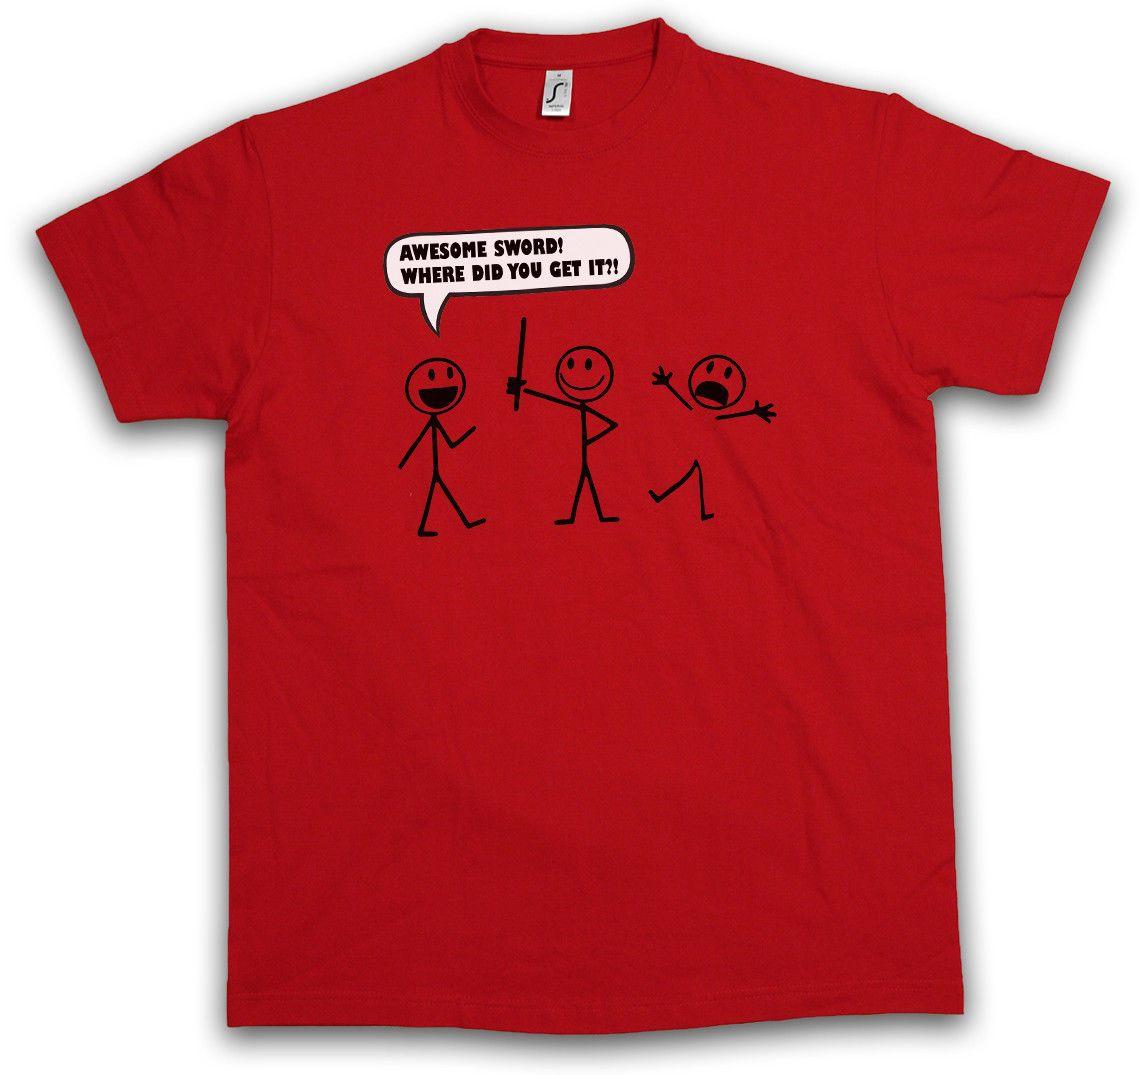 ebe0852f Awesome Sword T Shirt Stick Figure Strichmannchen Fun Comic Sizes S 3xl Men T  Shirt Print Cotton Short Sleeve T Shirt Tshirt Designs T Shirt Design  Template ...